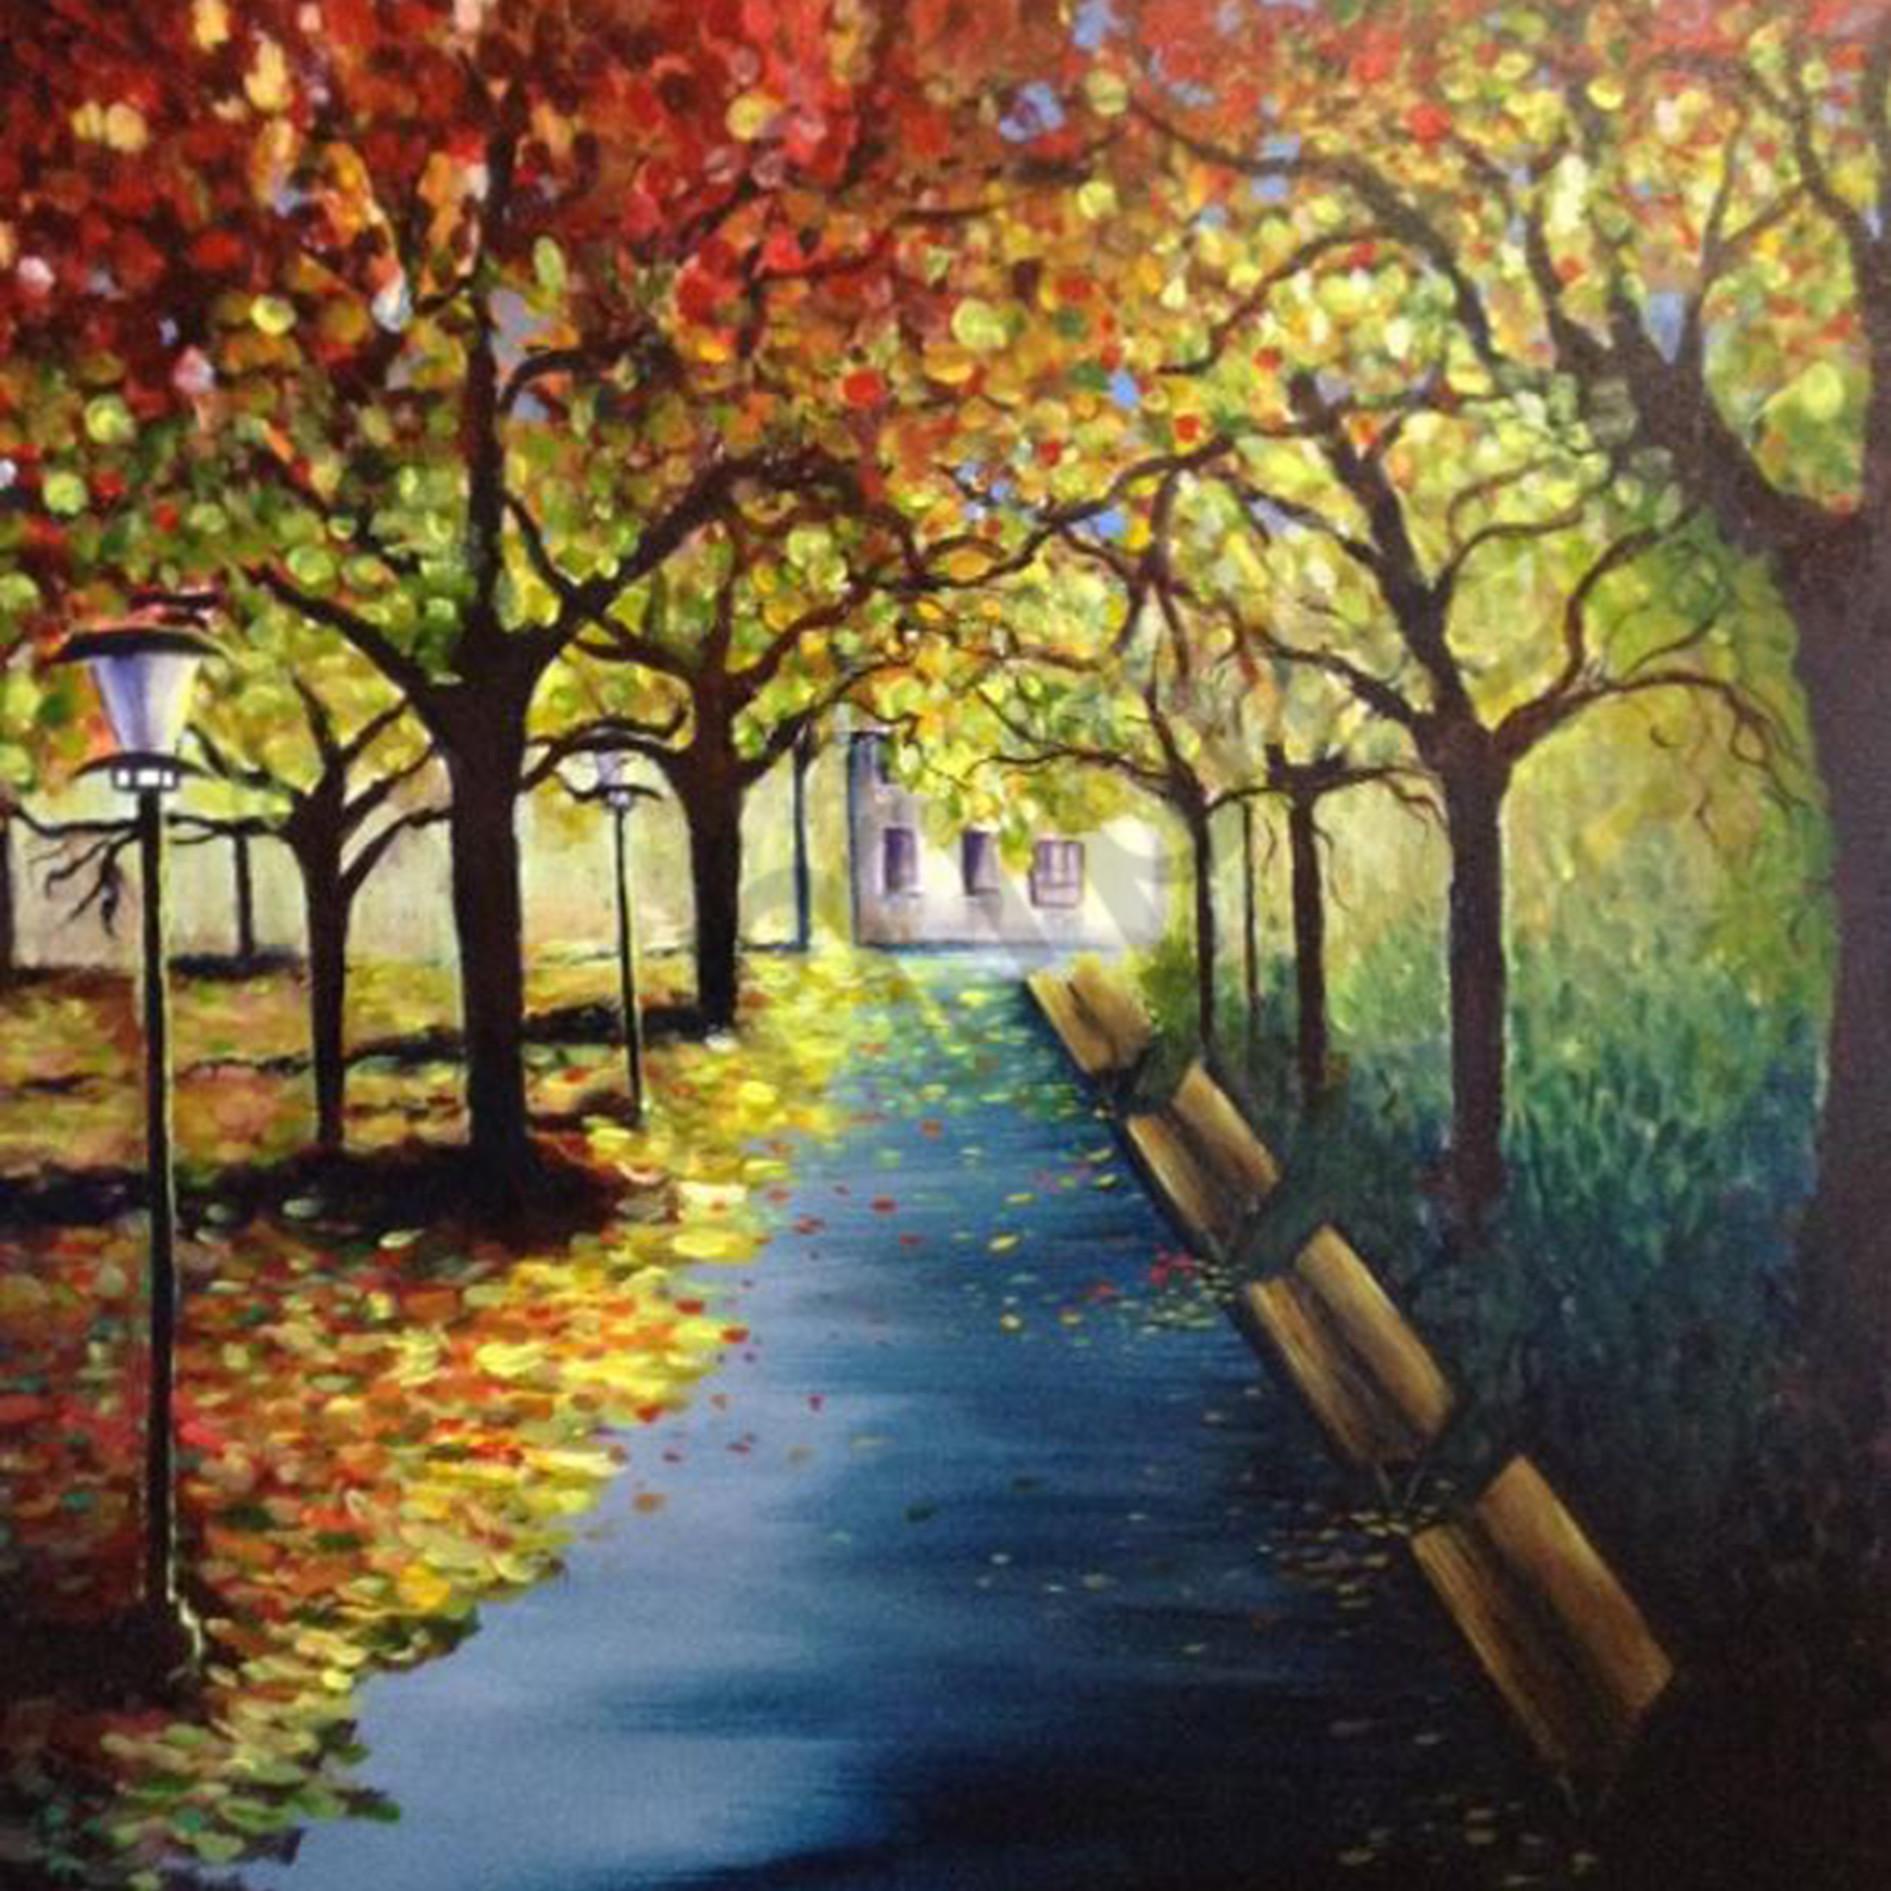 Seasons by anna di guglielmo uljvbt